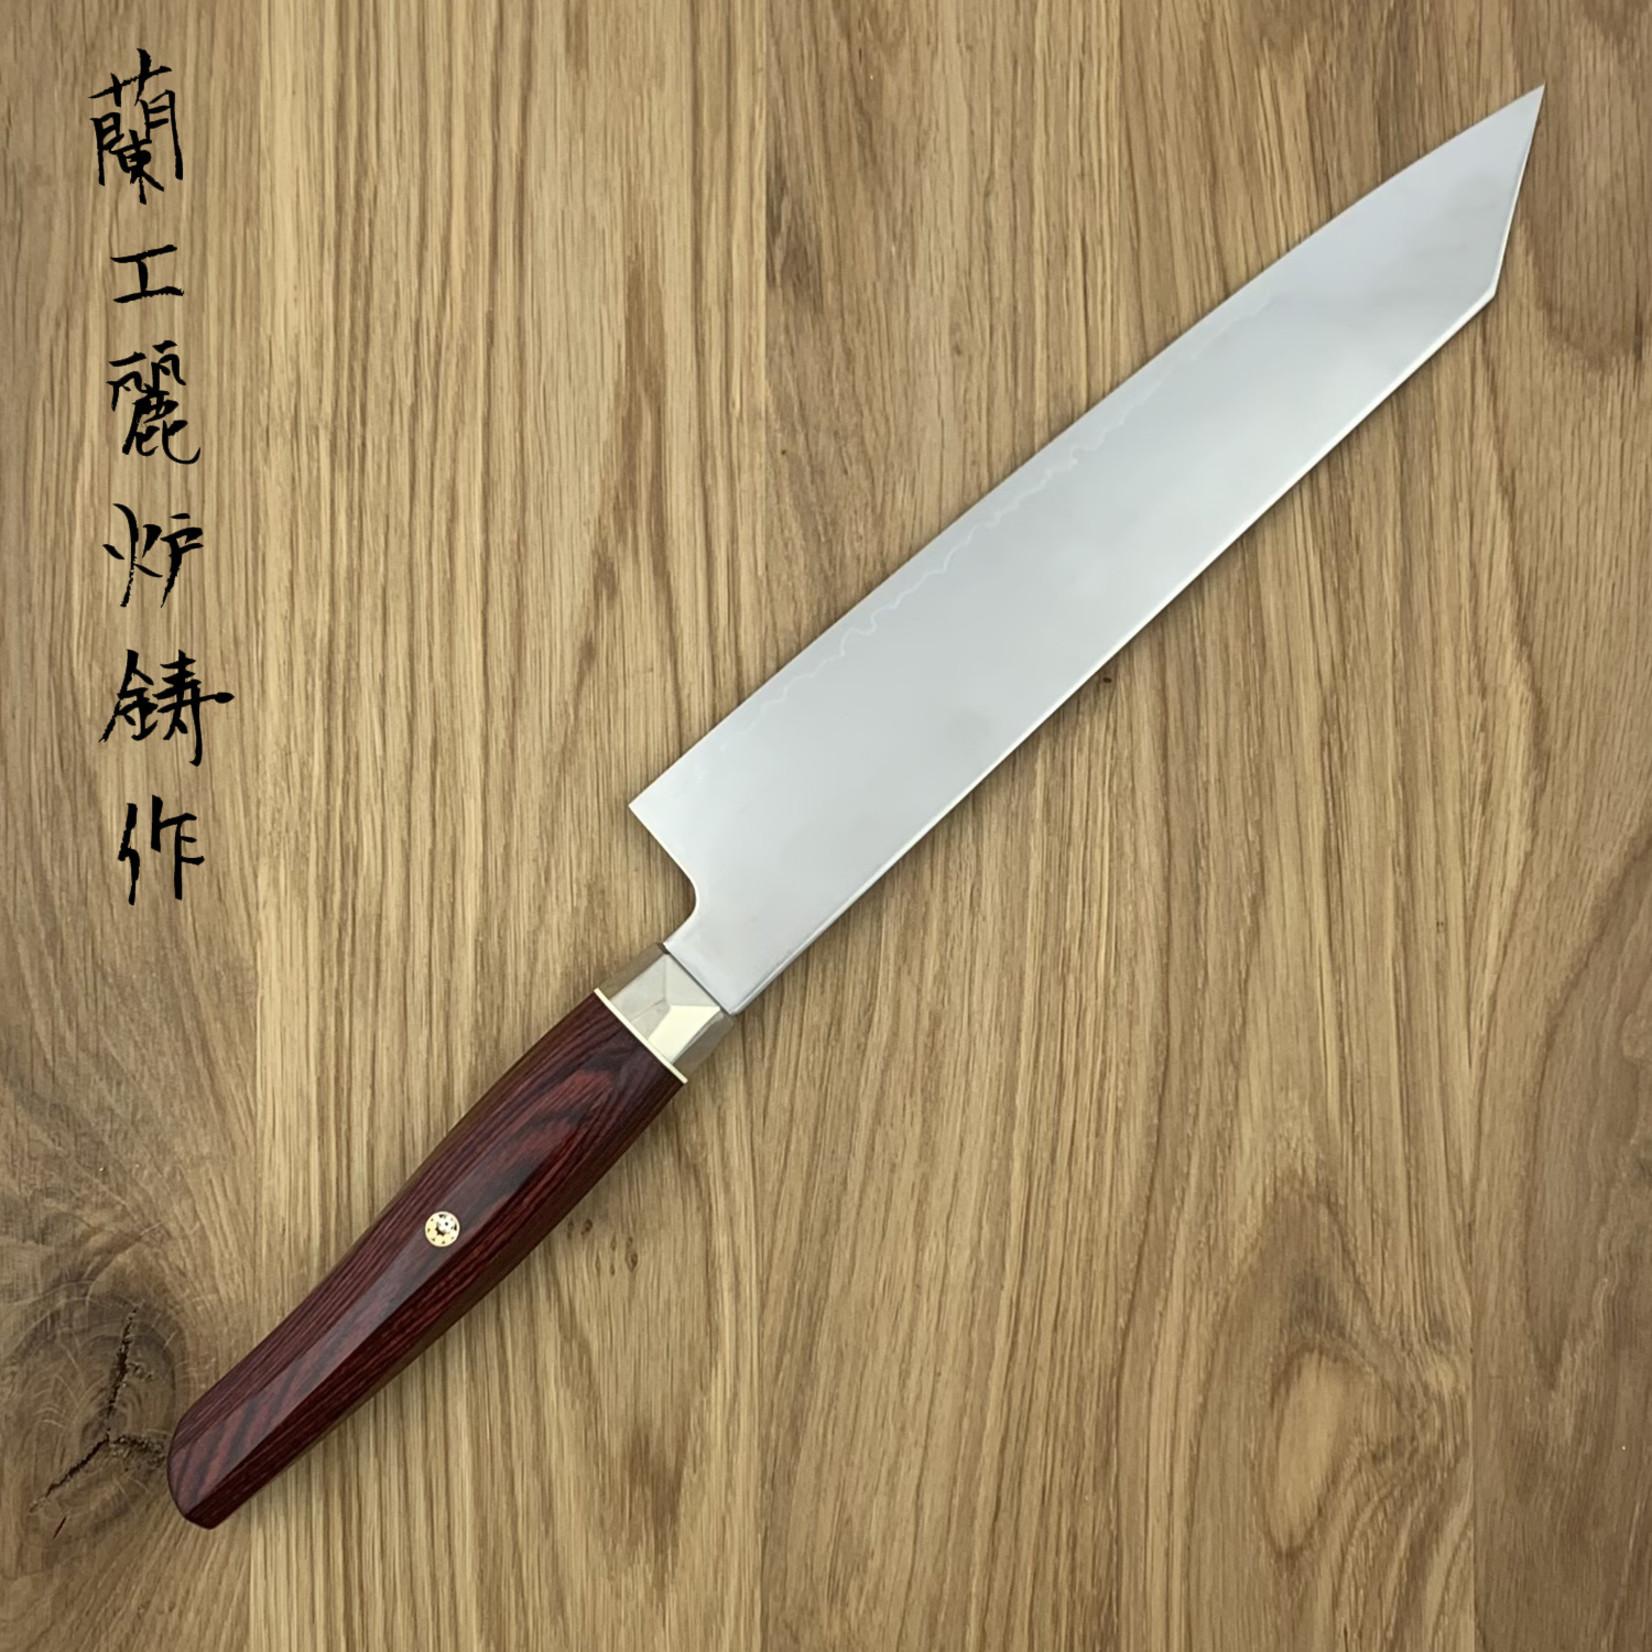 ZANMAI Revolution Red Kiritsuke 230 mm ZRR-1206G